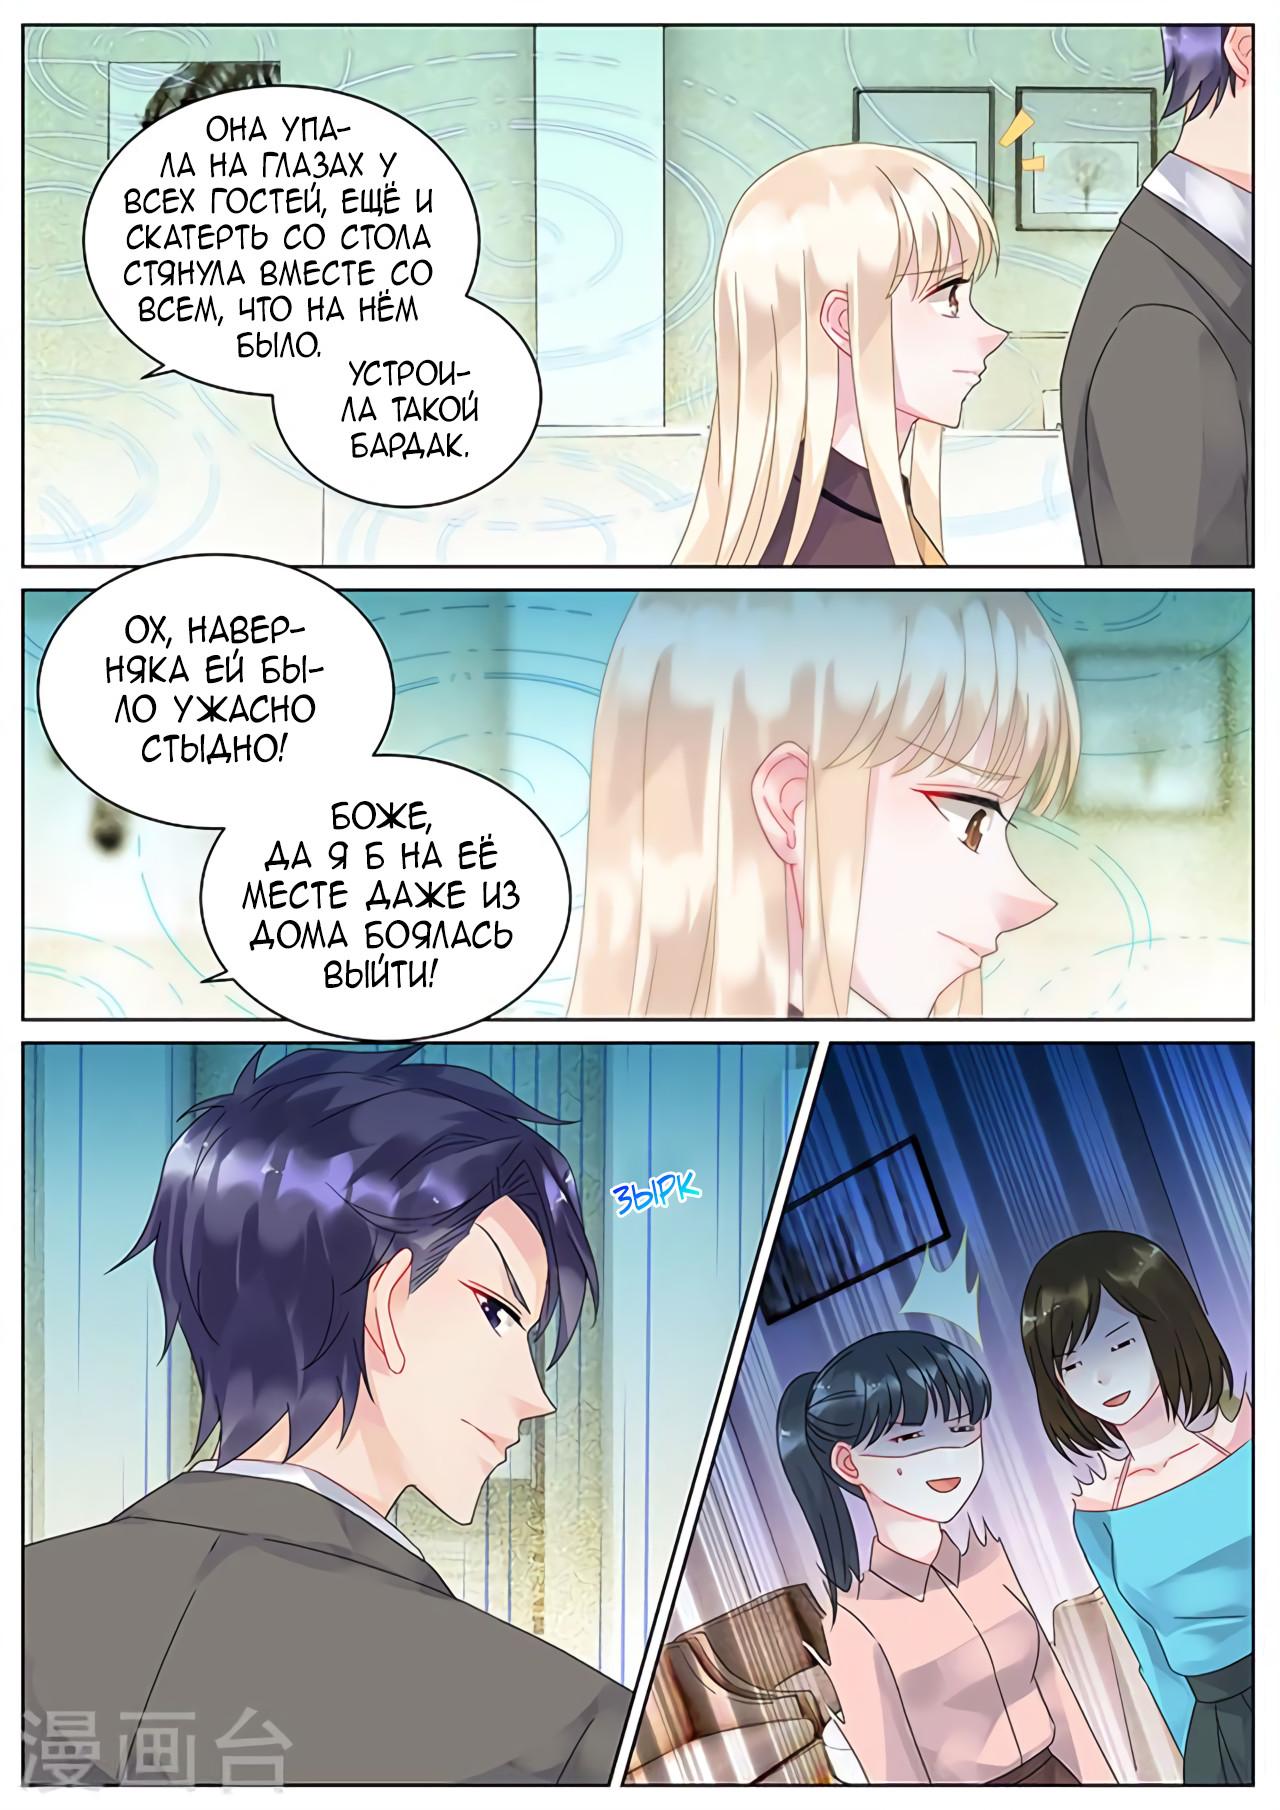 https://r2.ninemanga.com/comics/pic5/22/34710/1458105/1563905315121.jpg Page 7